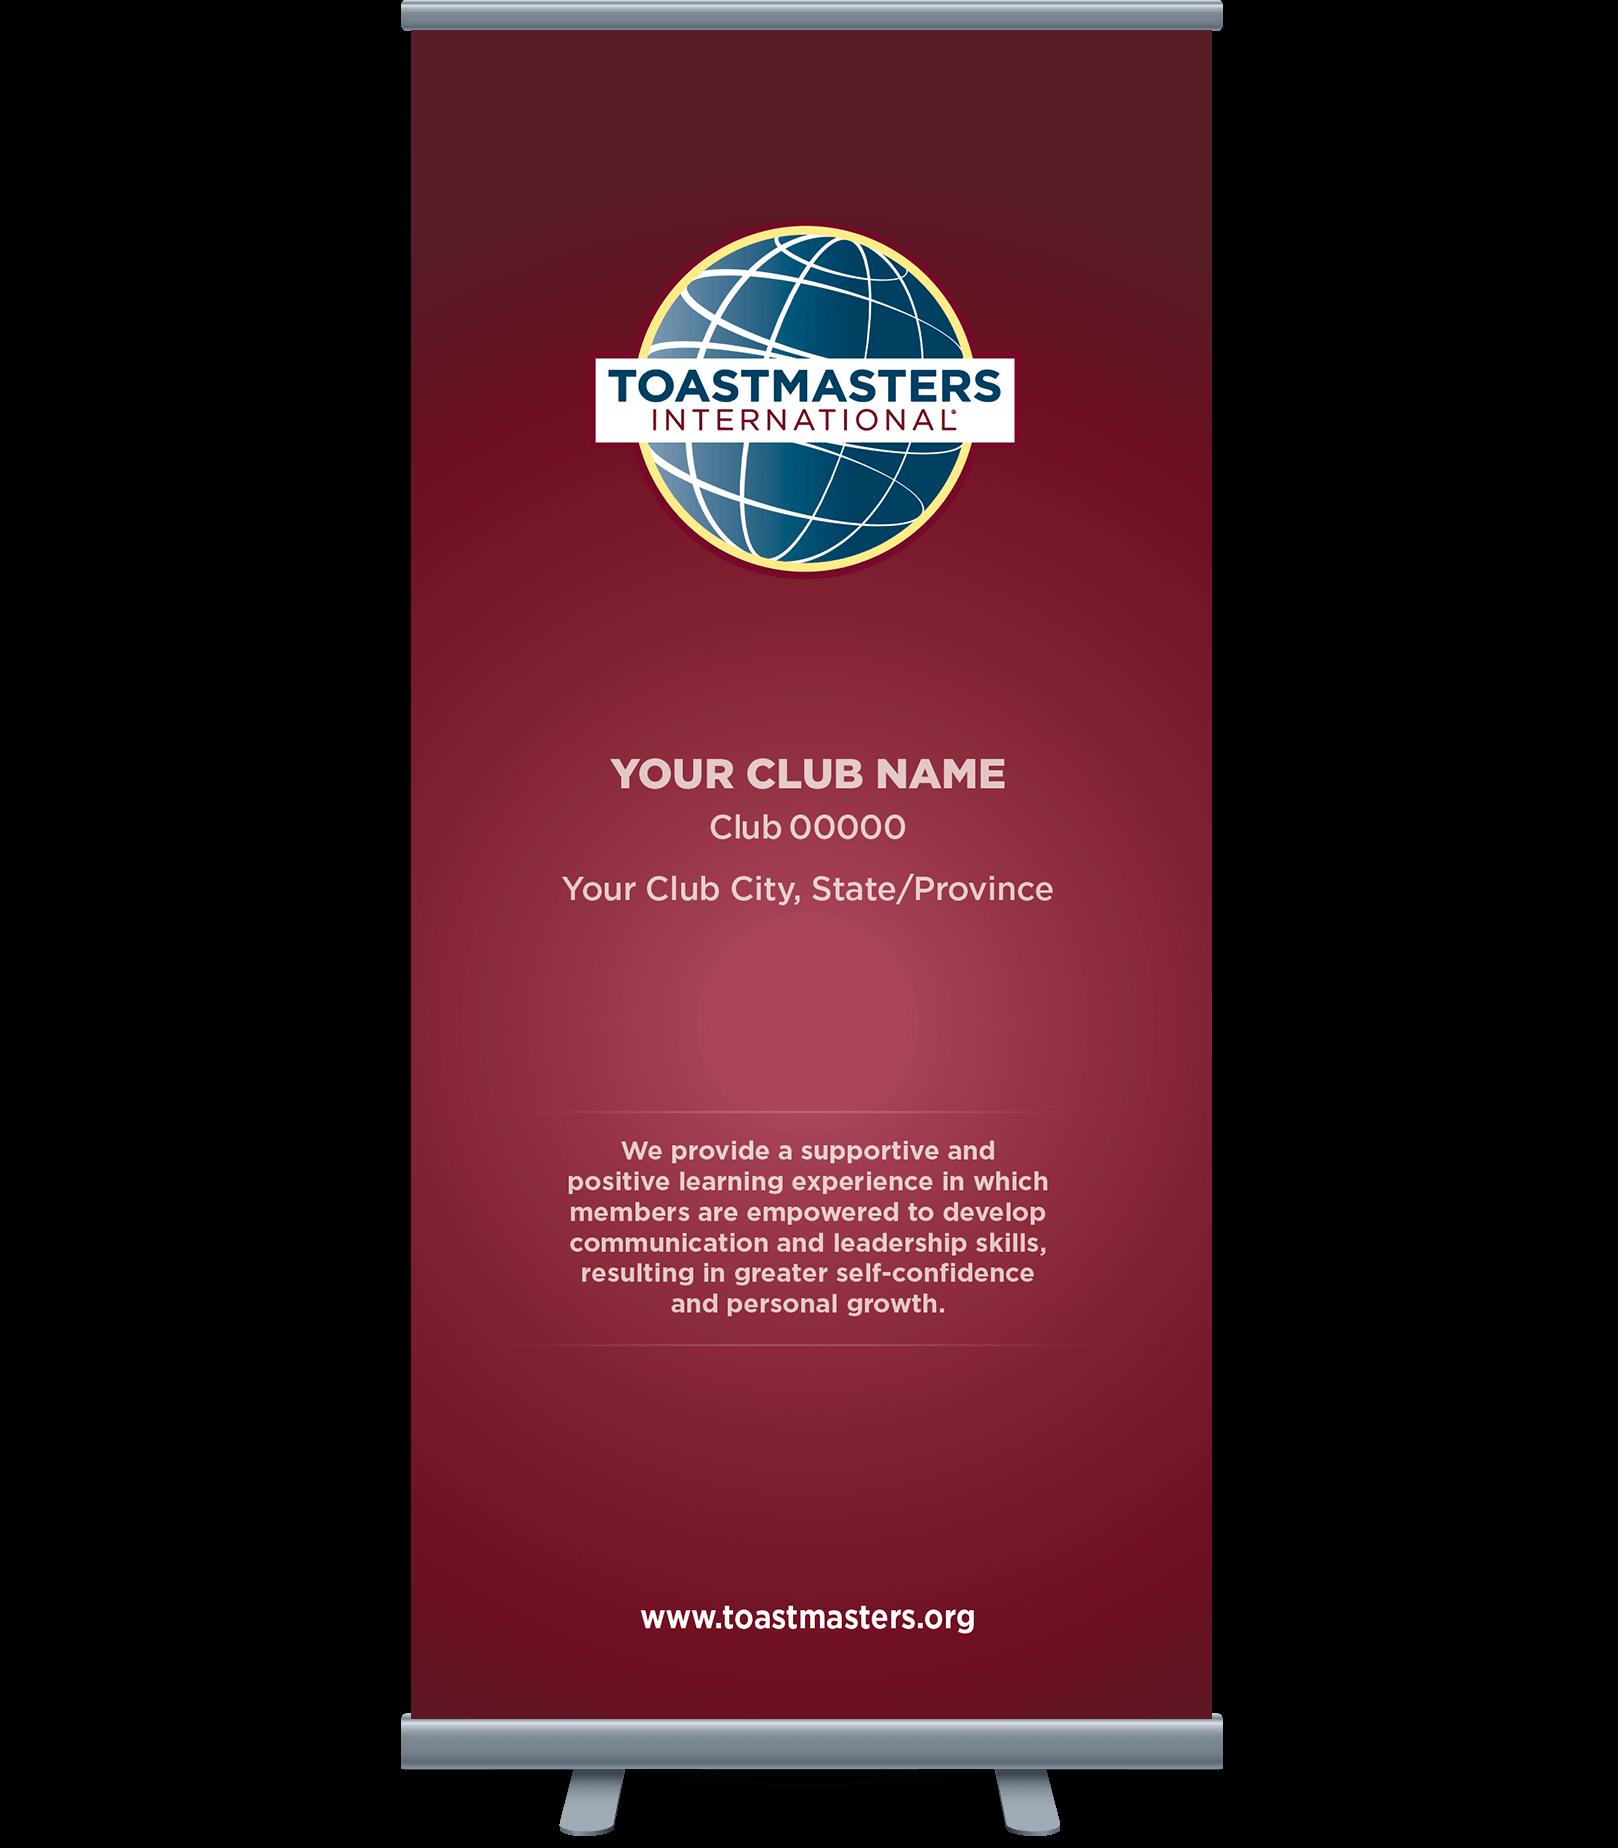 Custom Club Banner with burgundy background, globe logo and club mission statement